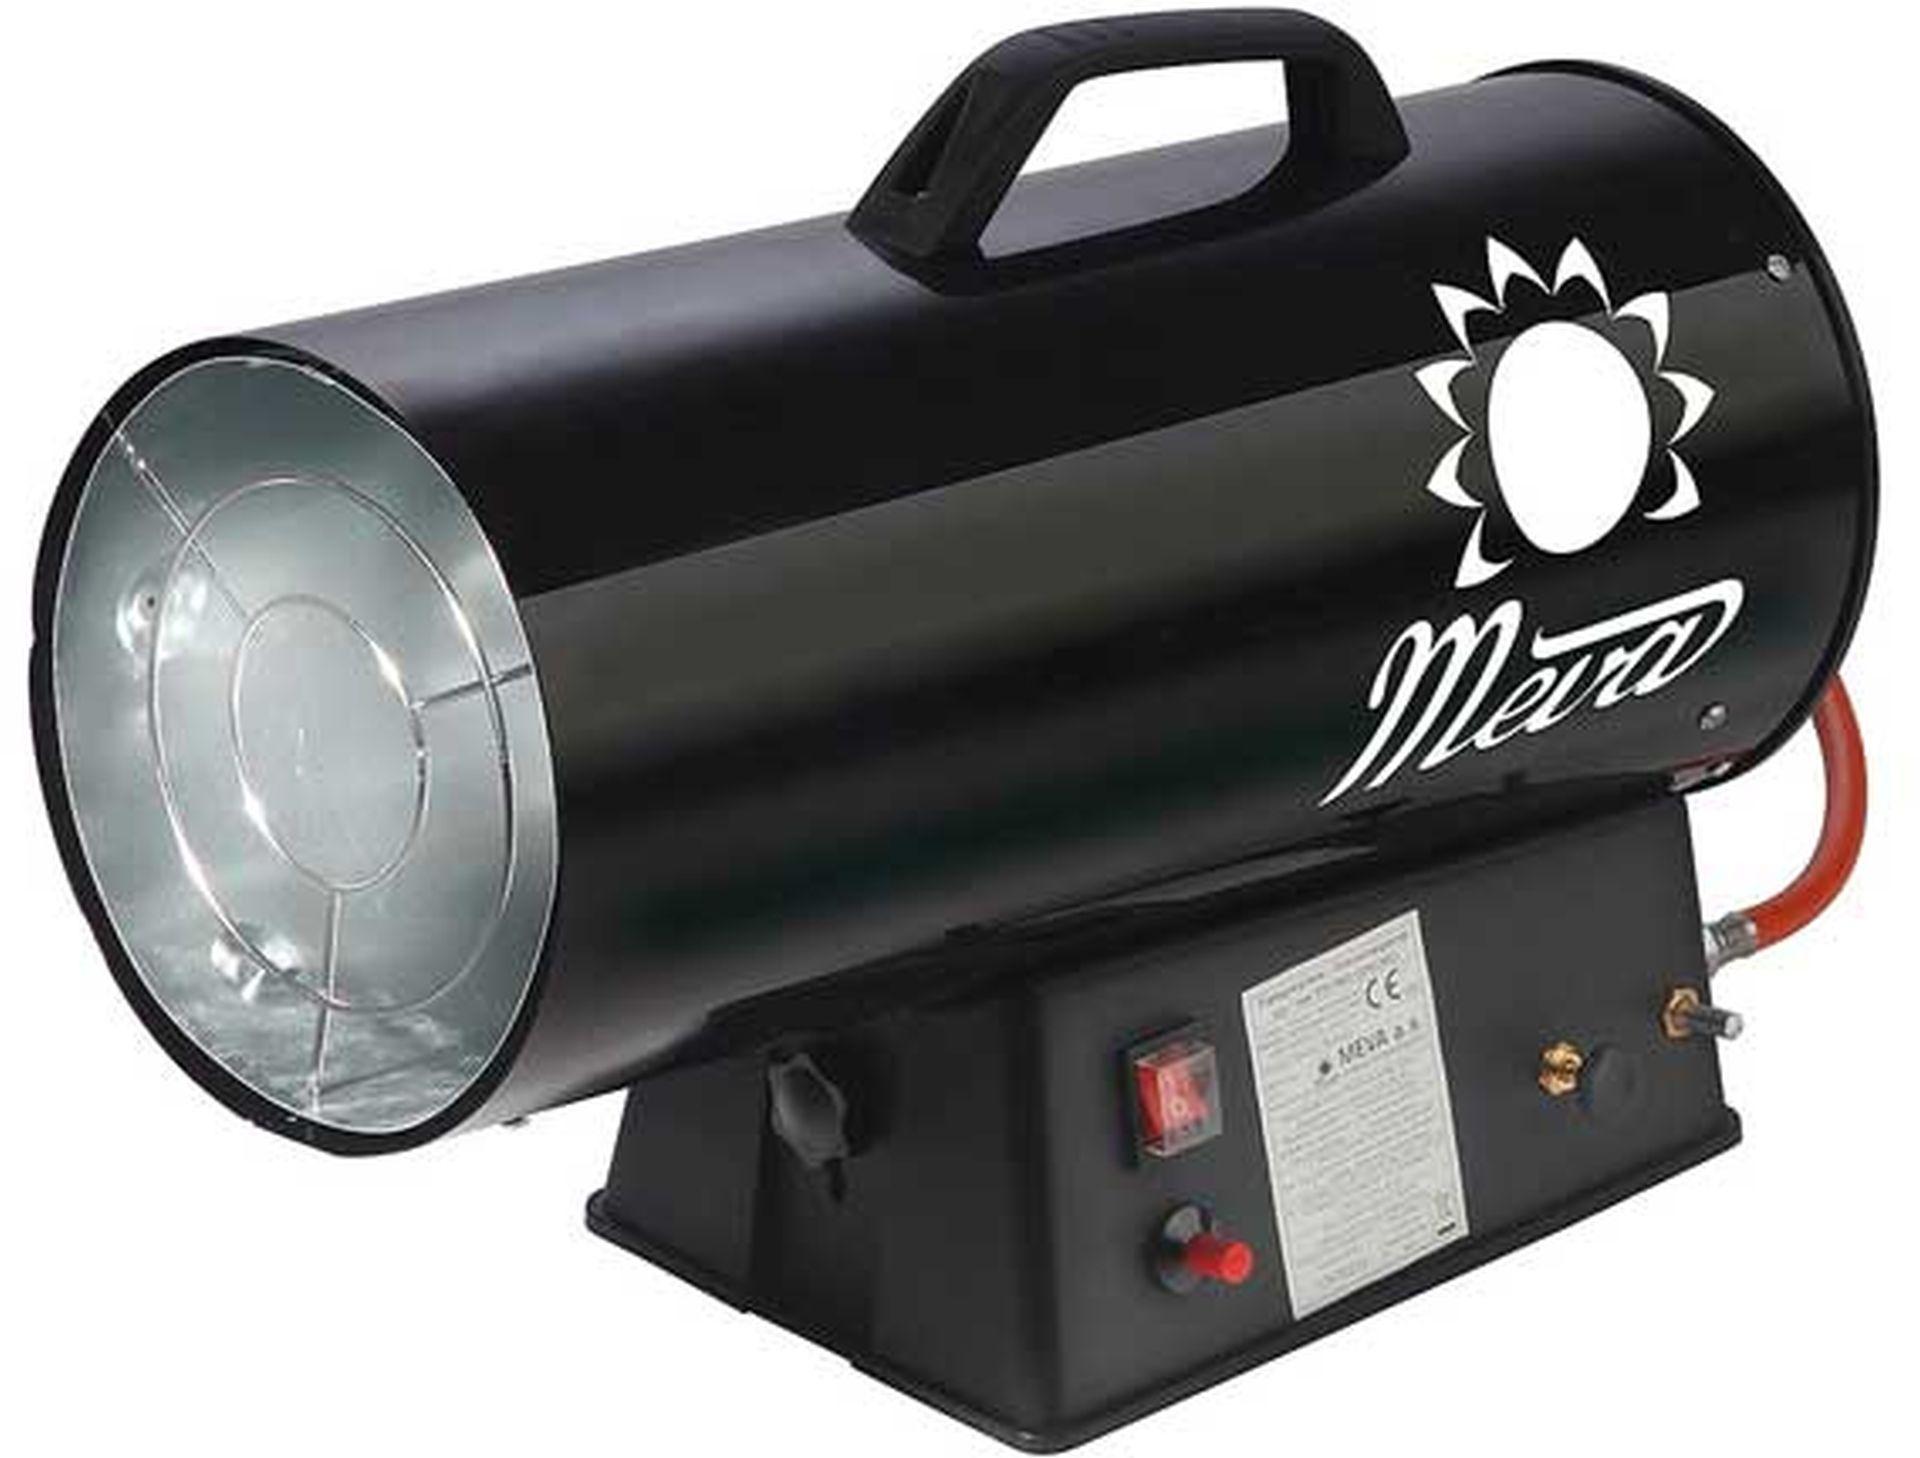 MEVA Teplogenerátor 9-30 kW s regulátorem a hadicí TP17002